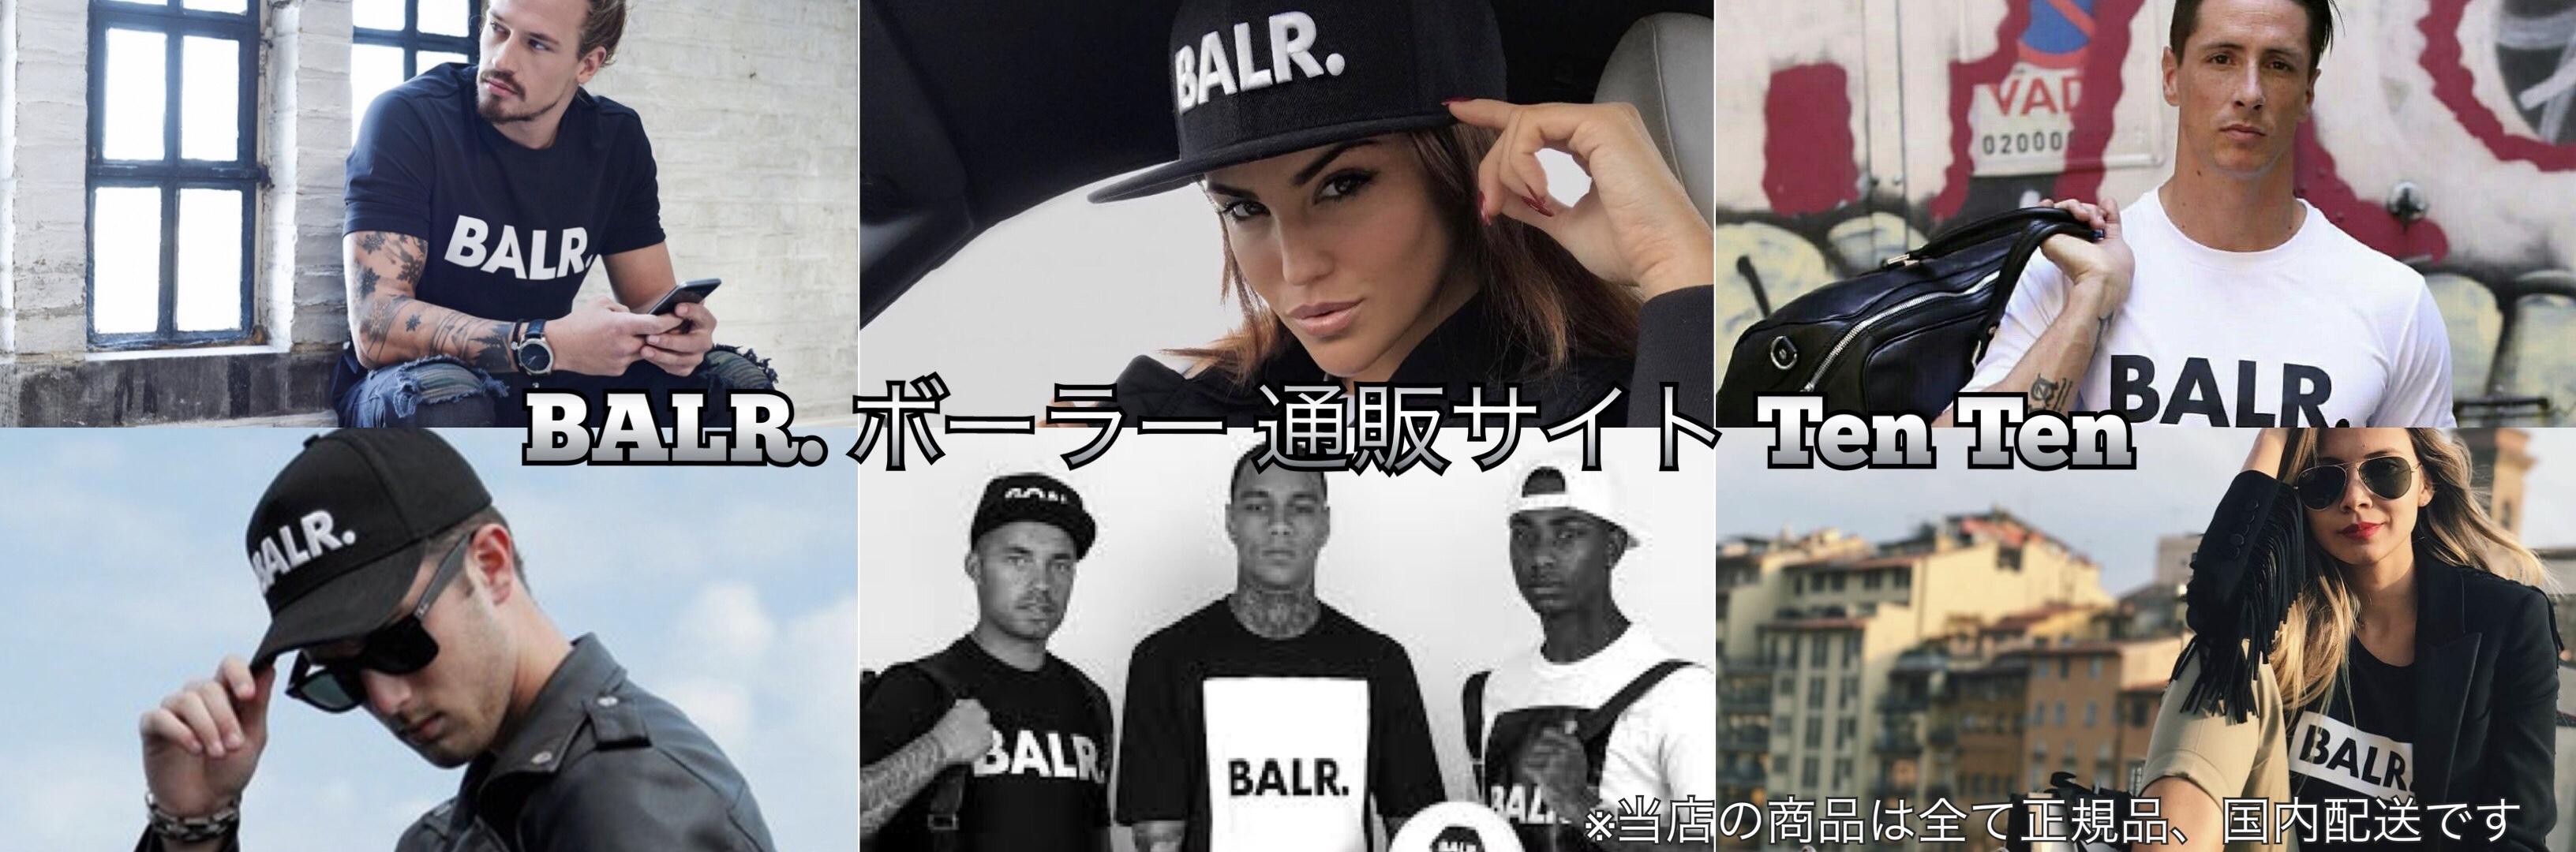 BALR. / ボーラー 正規品販売店  「TenTen」